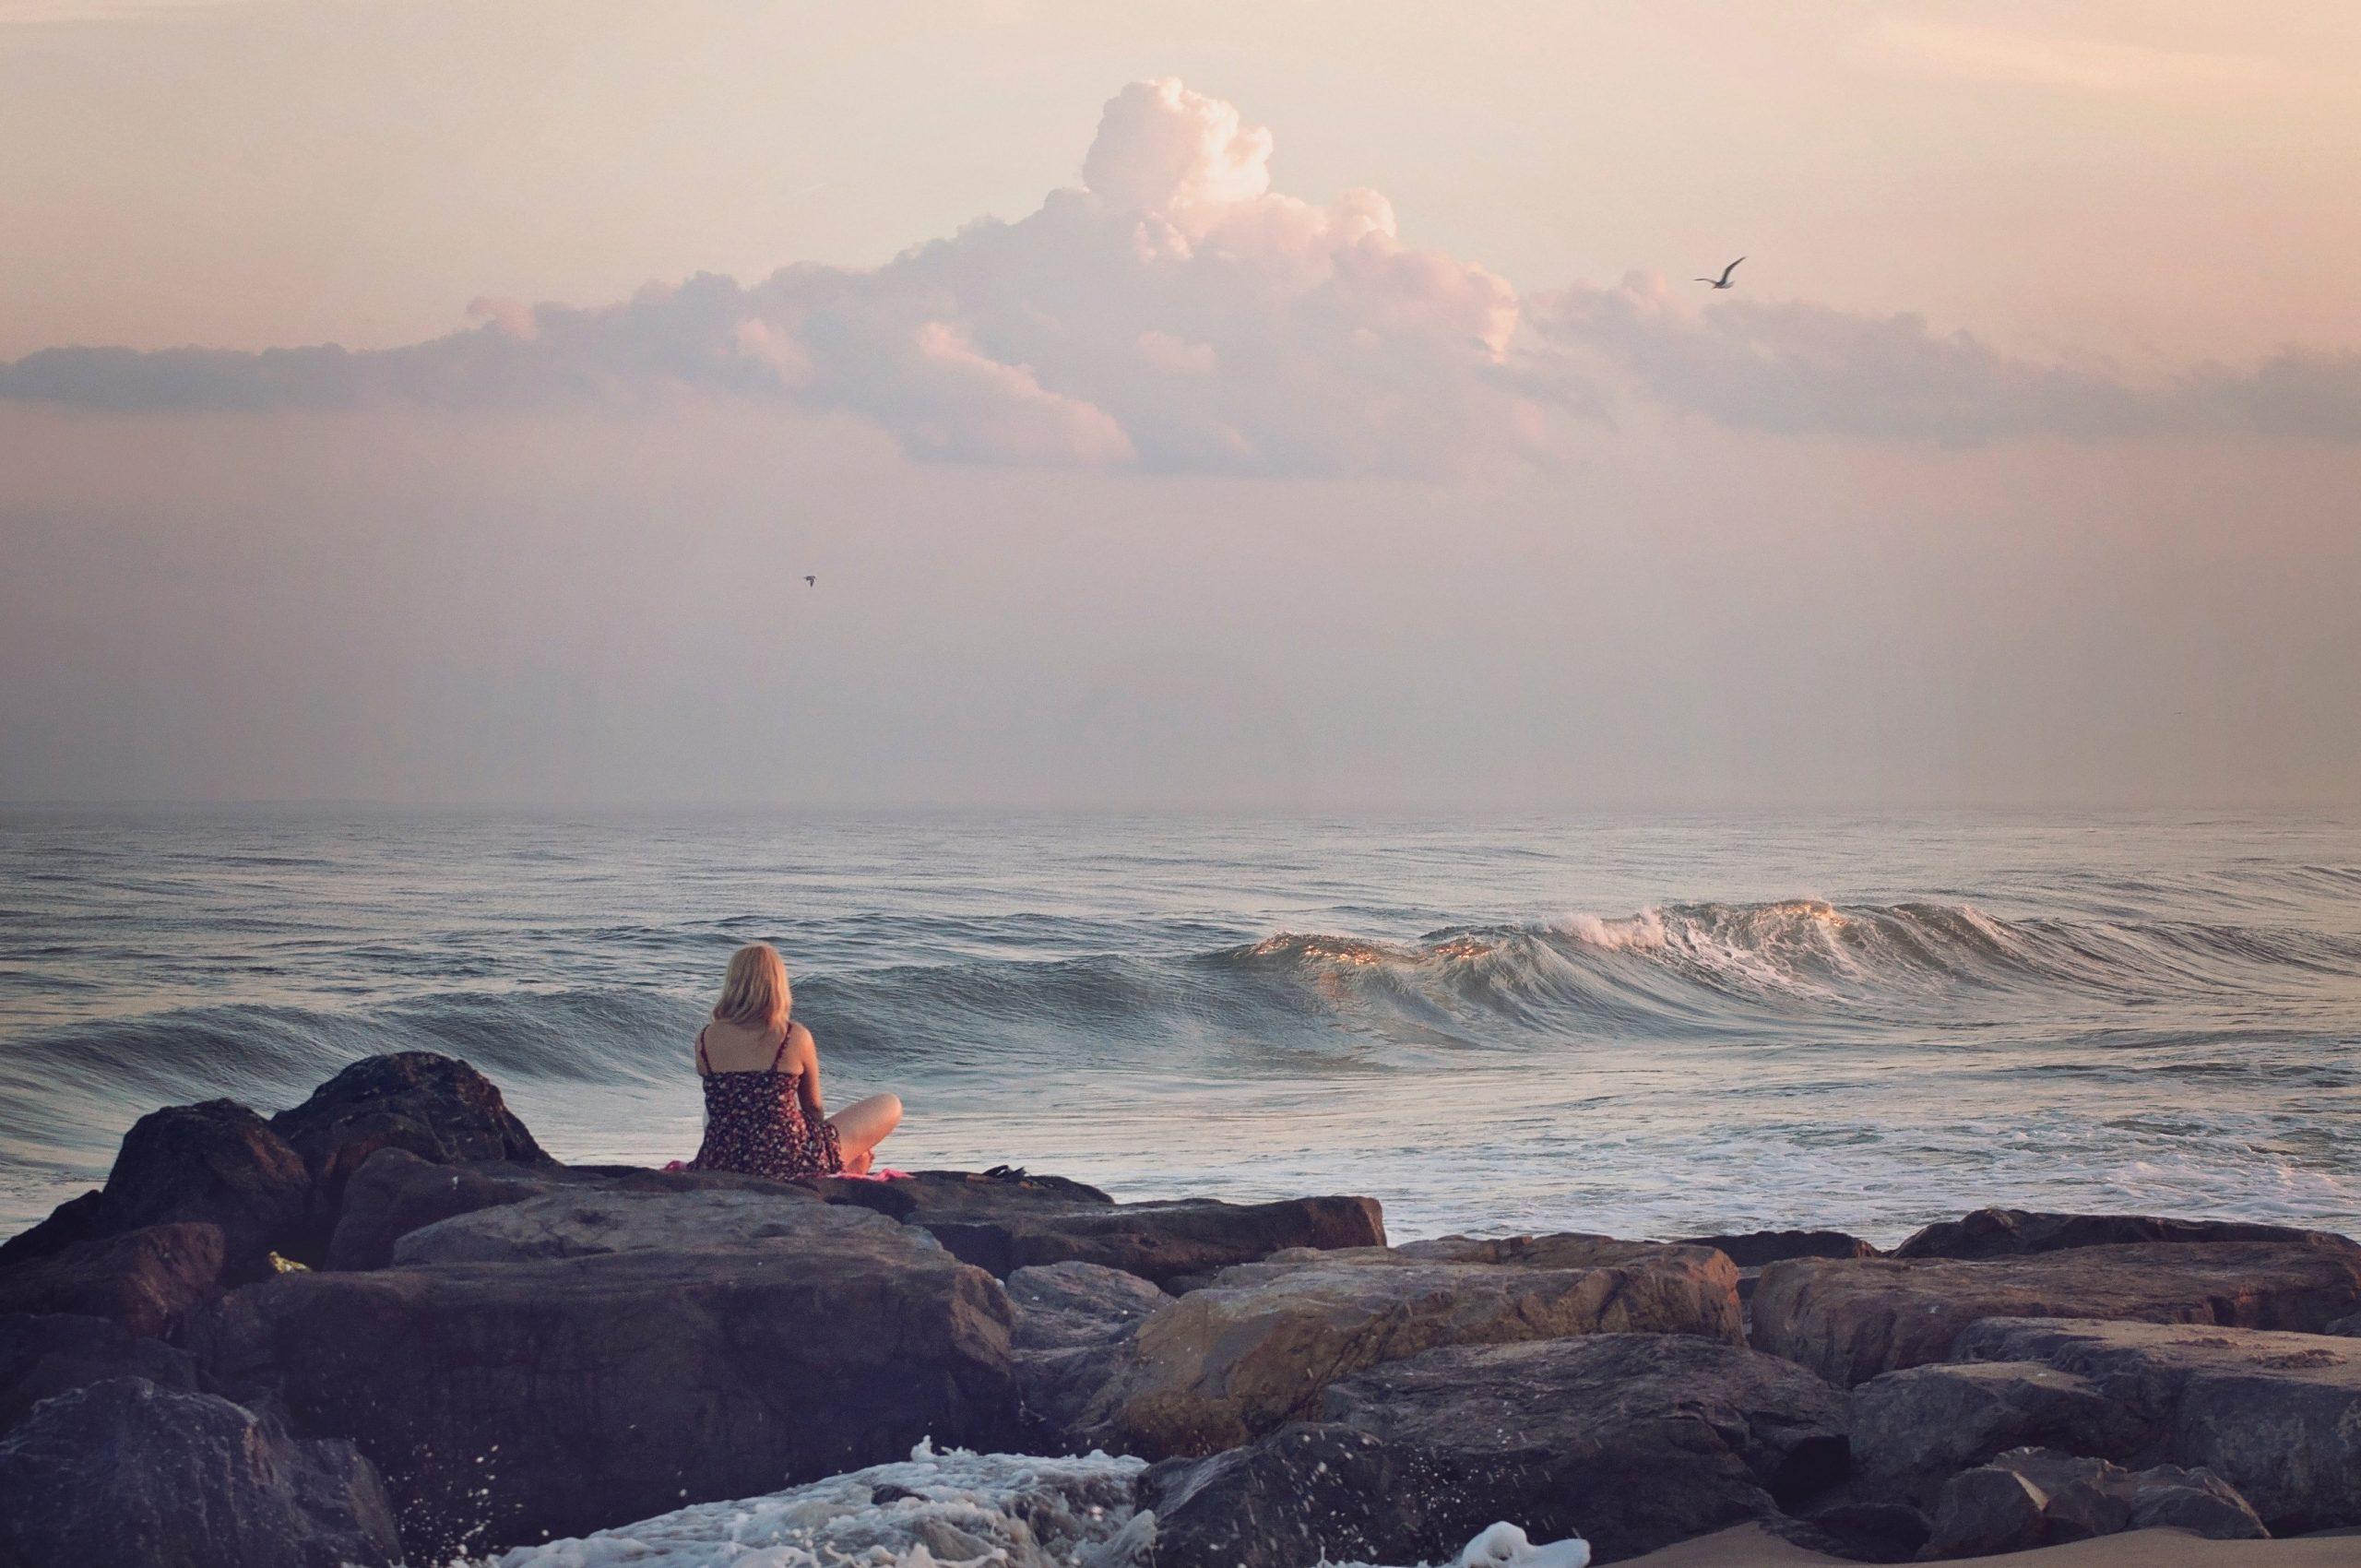 Vencer los miedos para atreverse a viajar sola 1